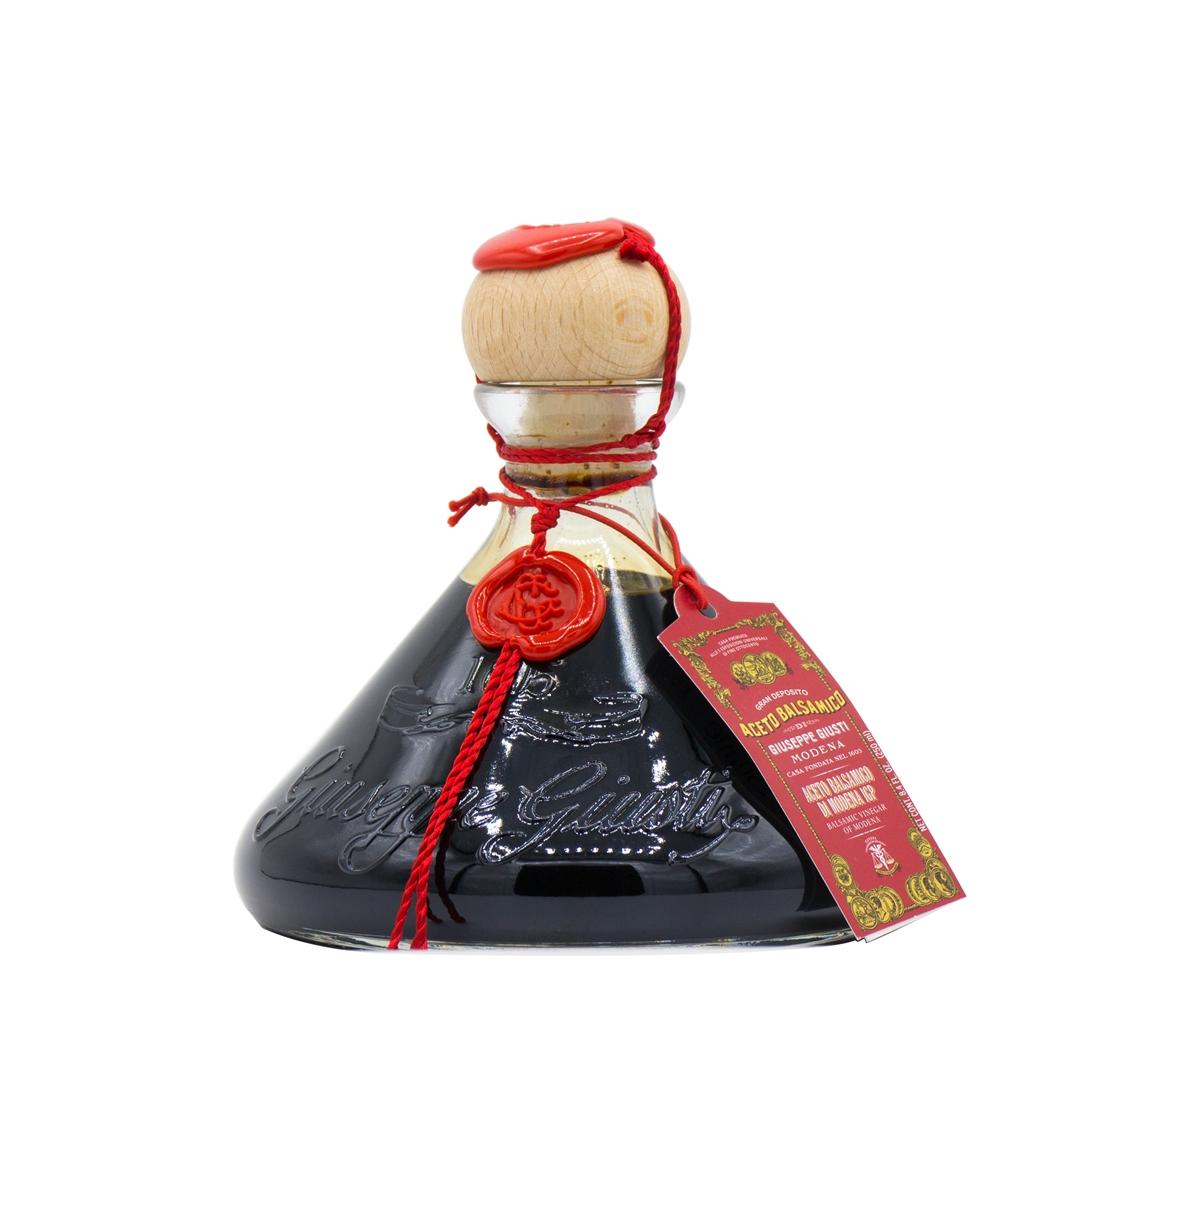 Aceto Balsamico di Modena IGP - 3 Medaglie d'Oro - Zucchetta da 250 ml